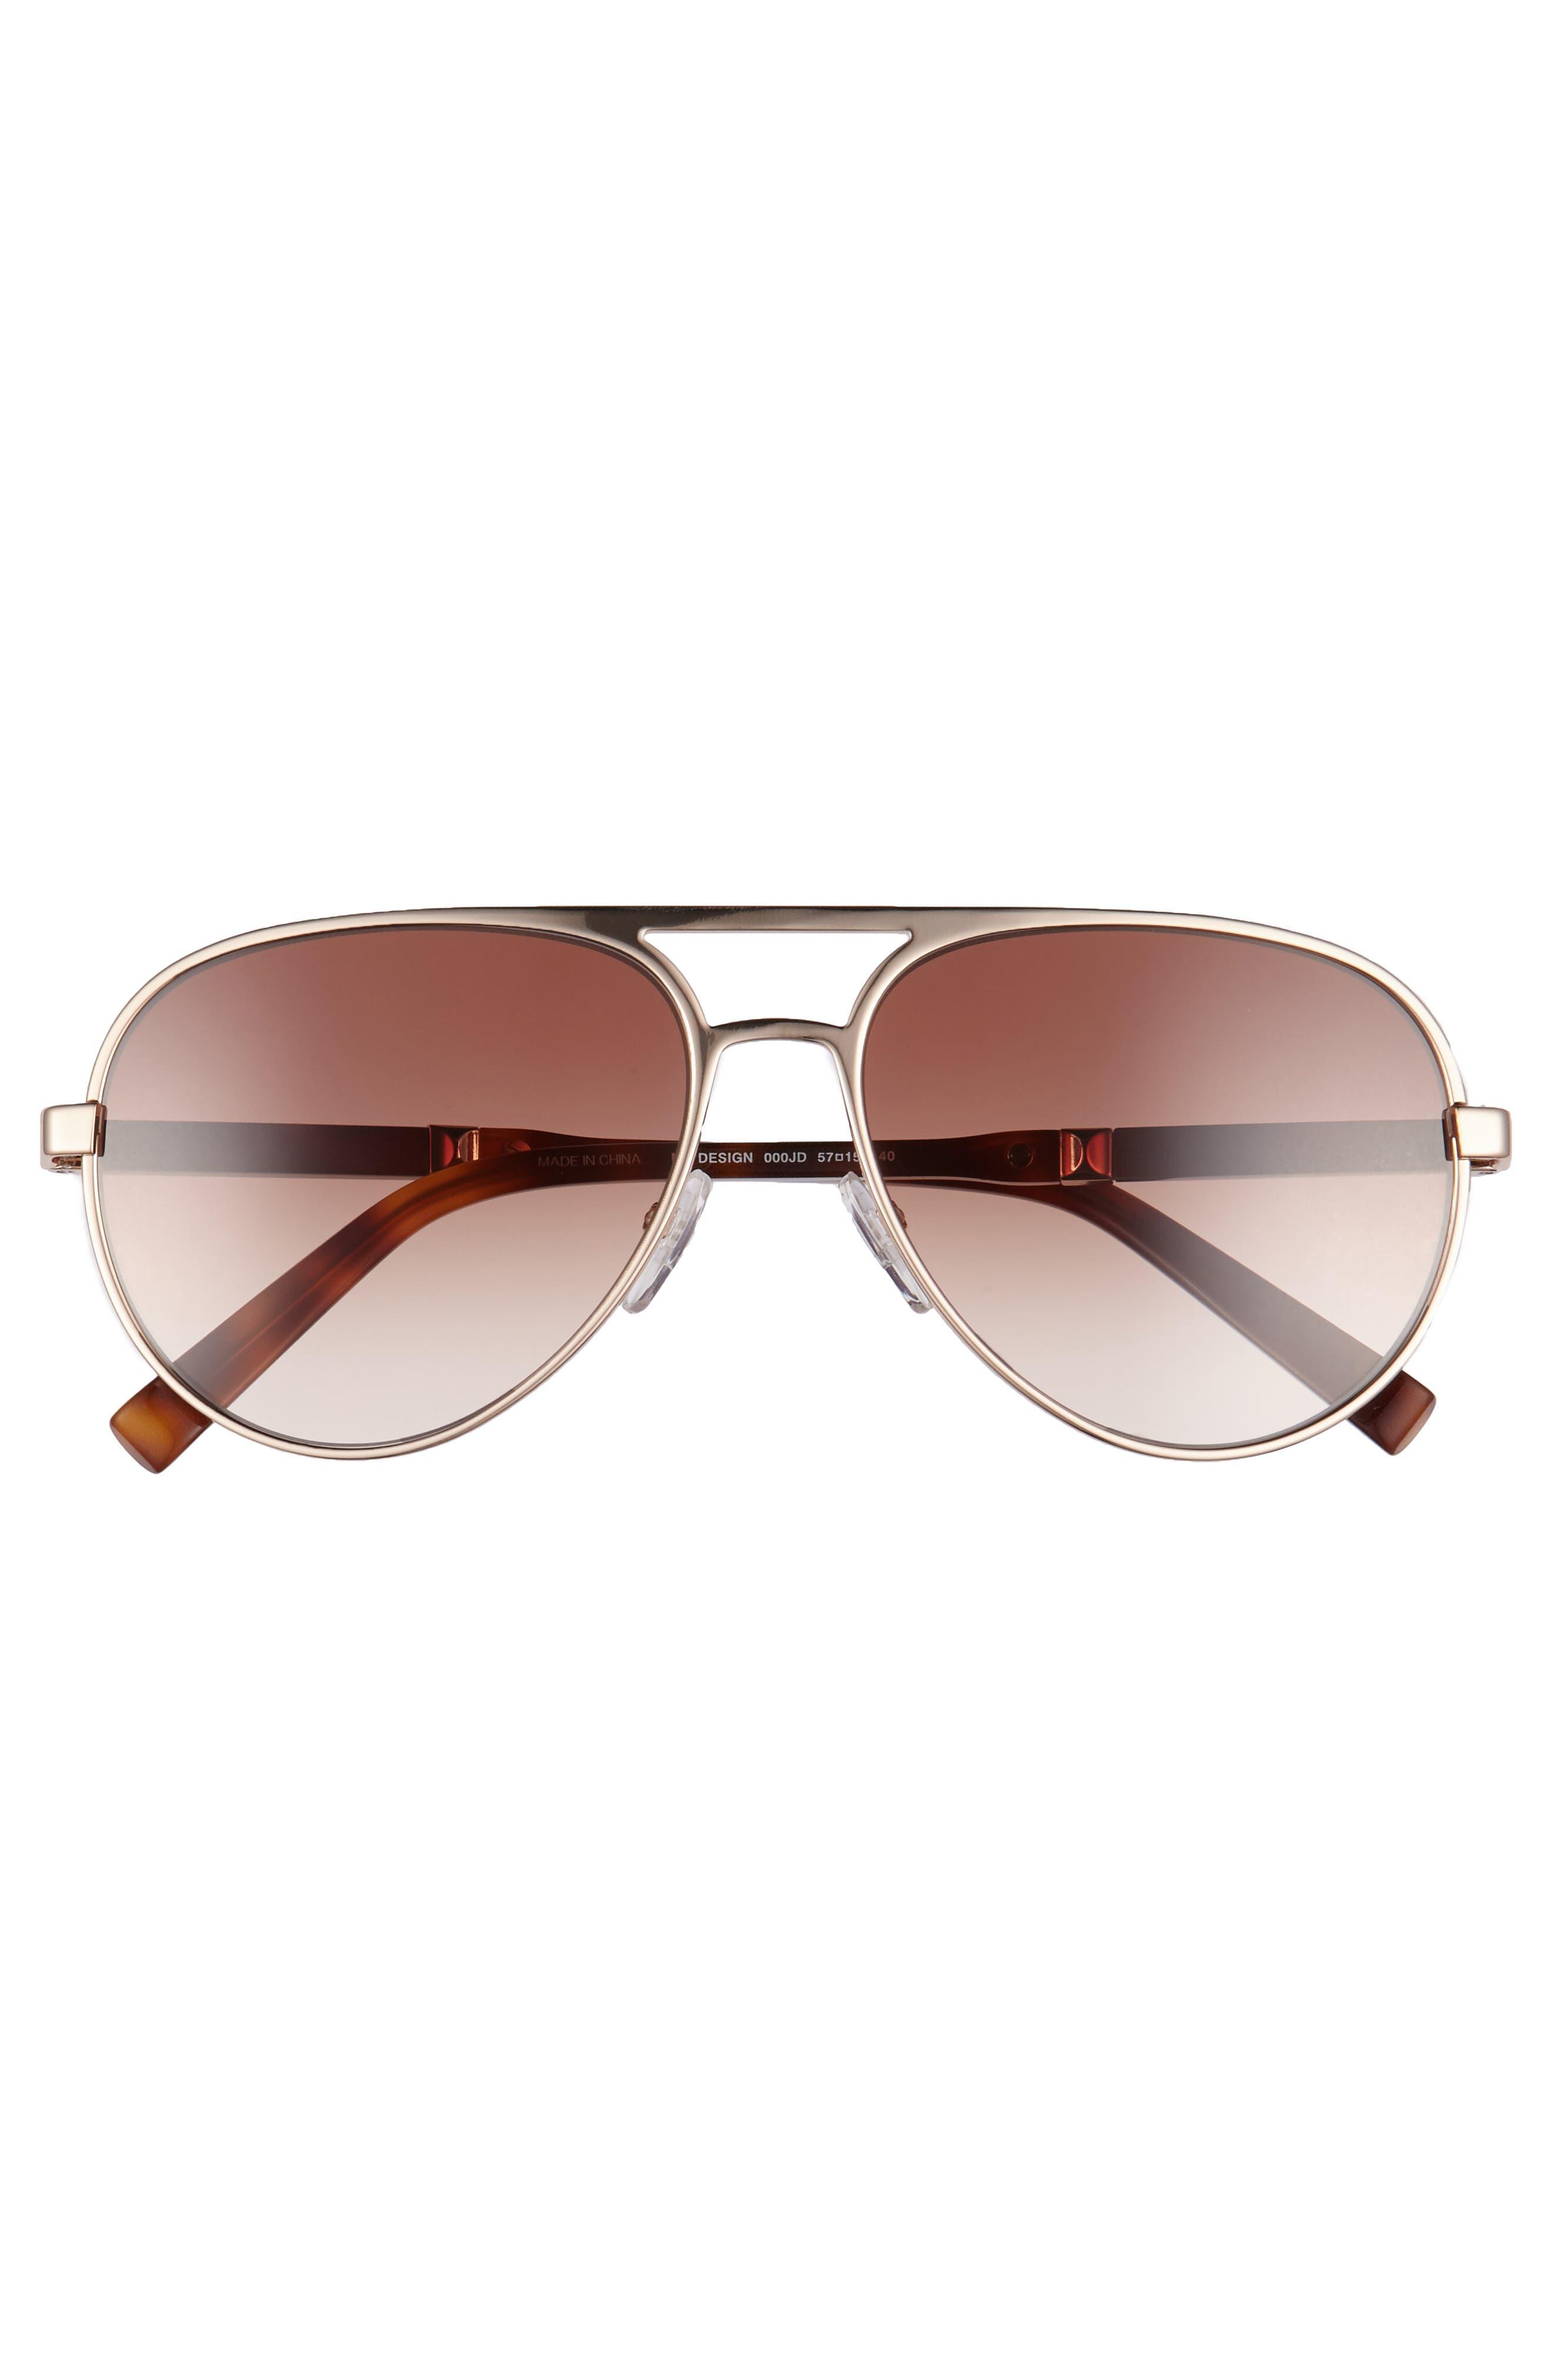 Desigs 57mm Gradient Aviator Sunglasses,                             Alternate thumbnail 3, color,                             710